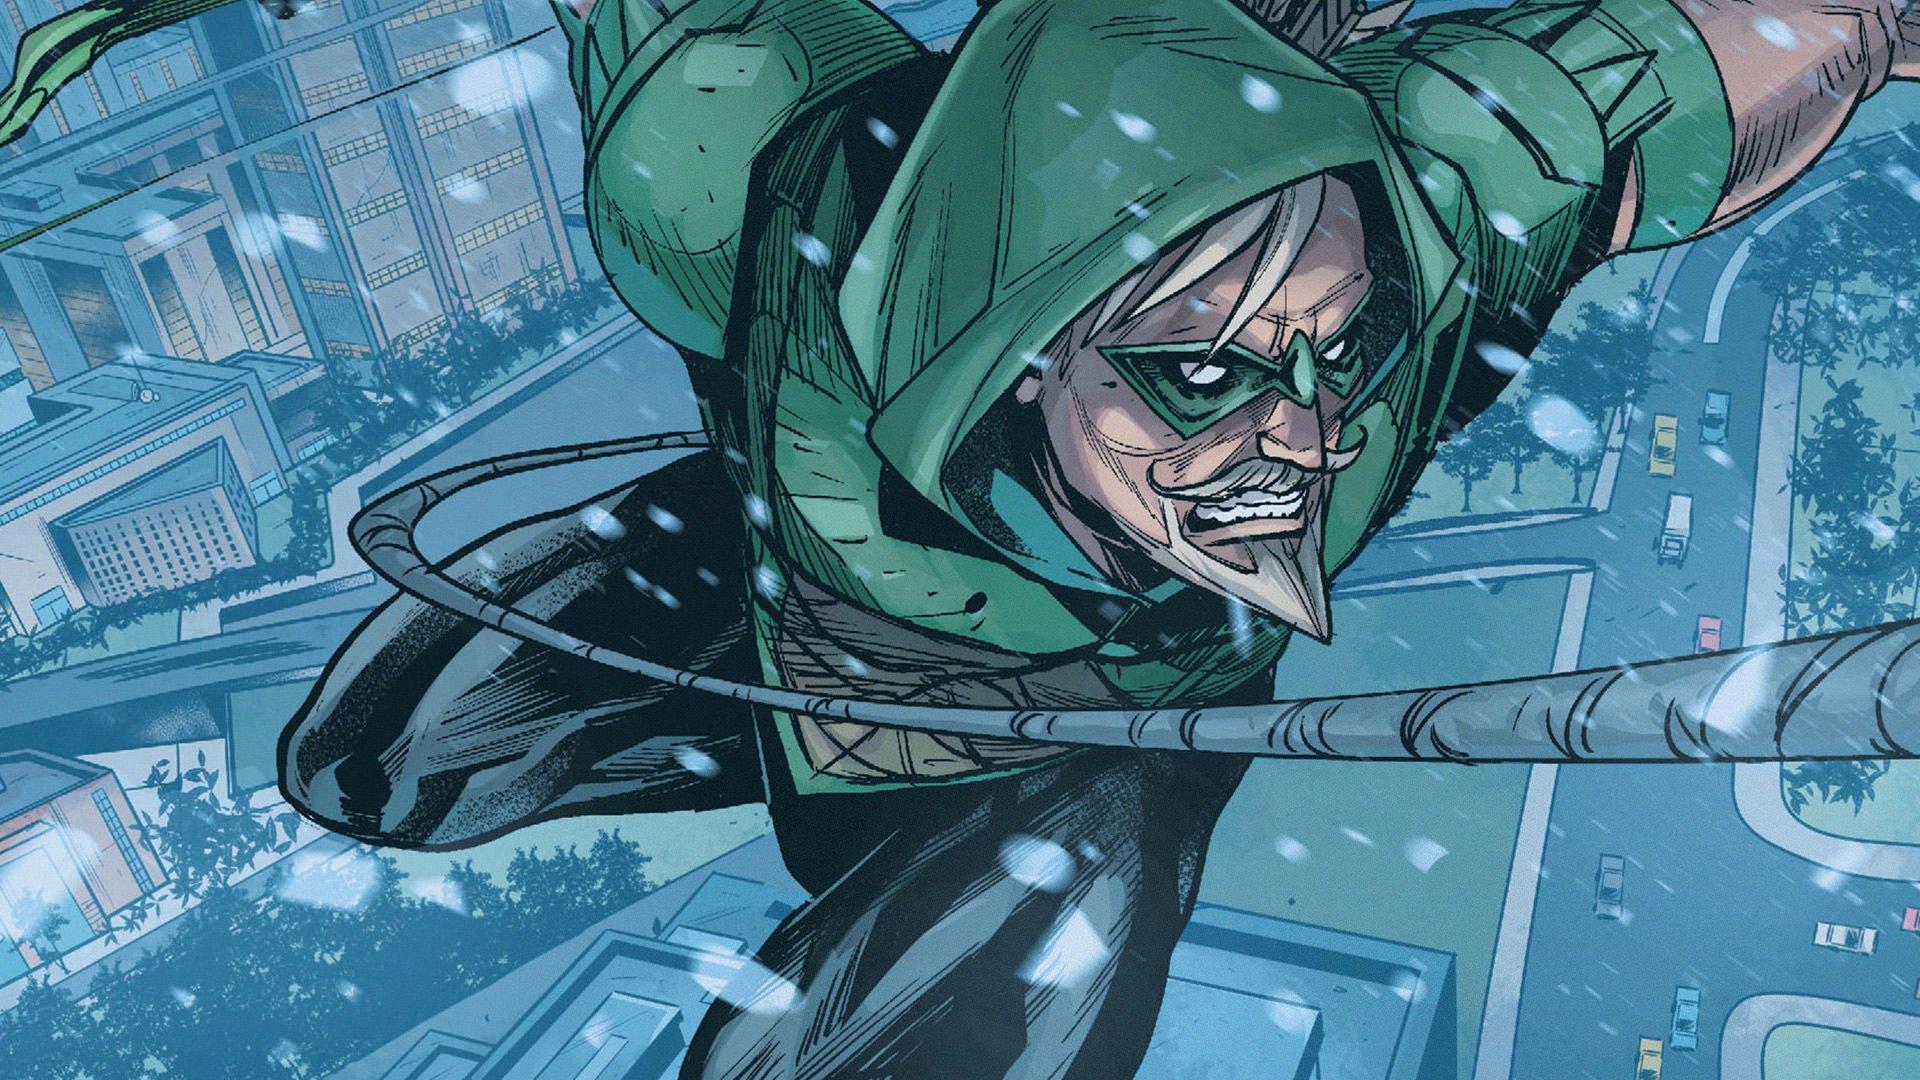 Green Arrow HD Wallpaper | Background Image | 1920x1080 ...